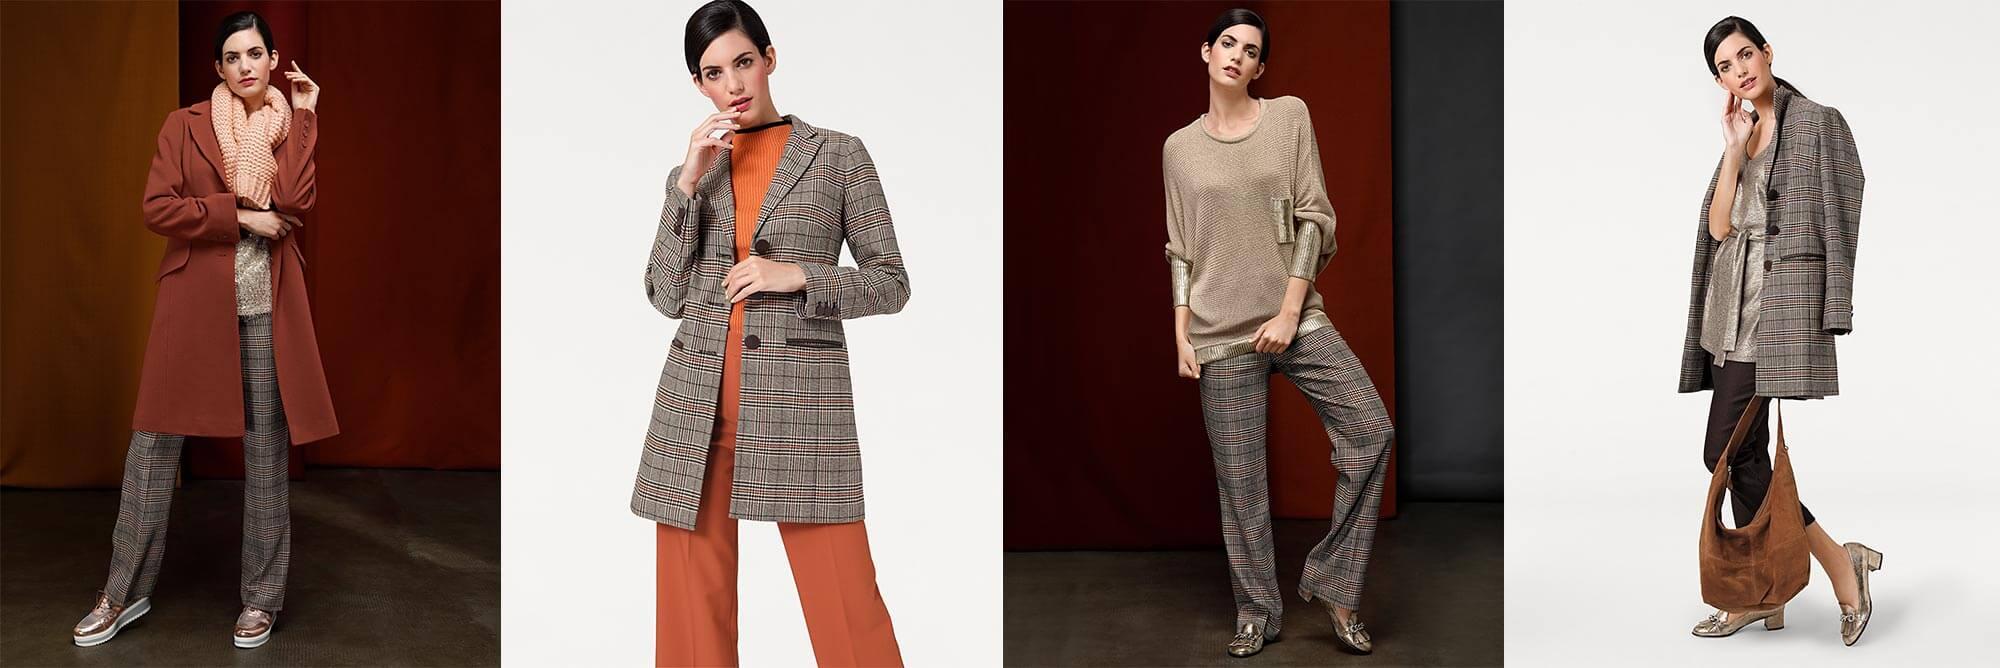 Outfit-Inspirationen: Verschiedene Outfits mit Glencheck-Muster